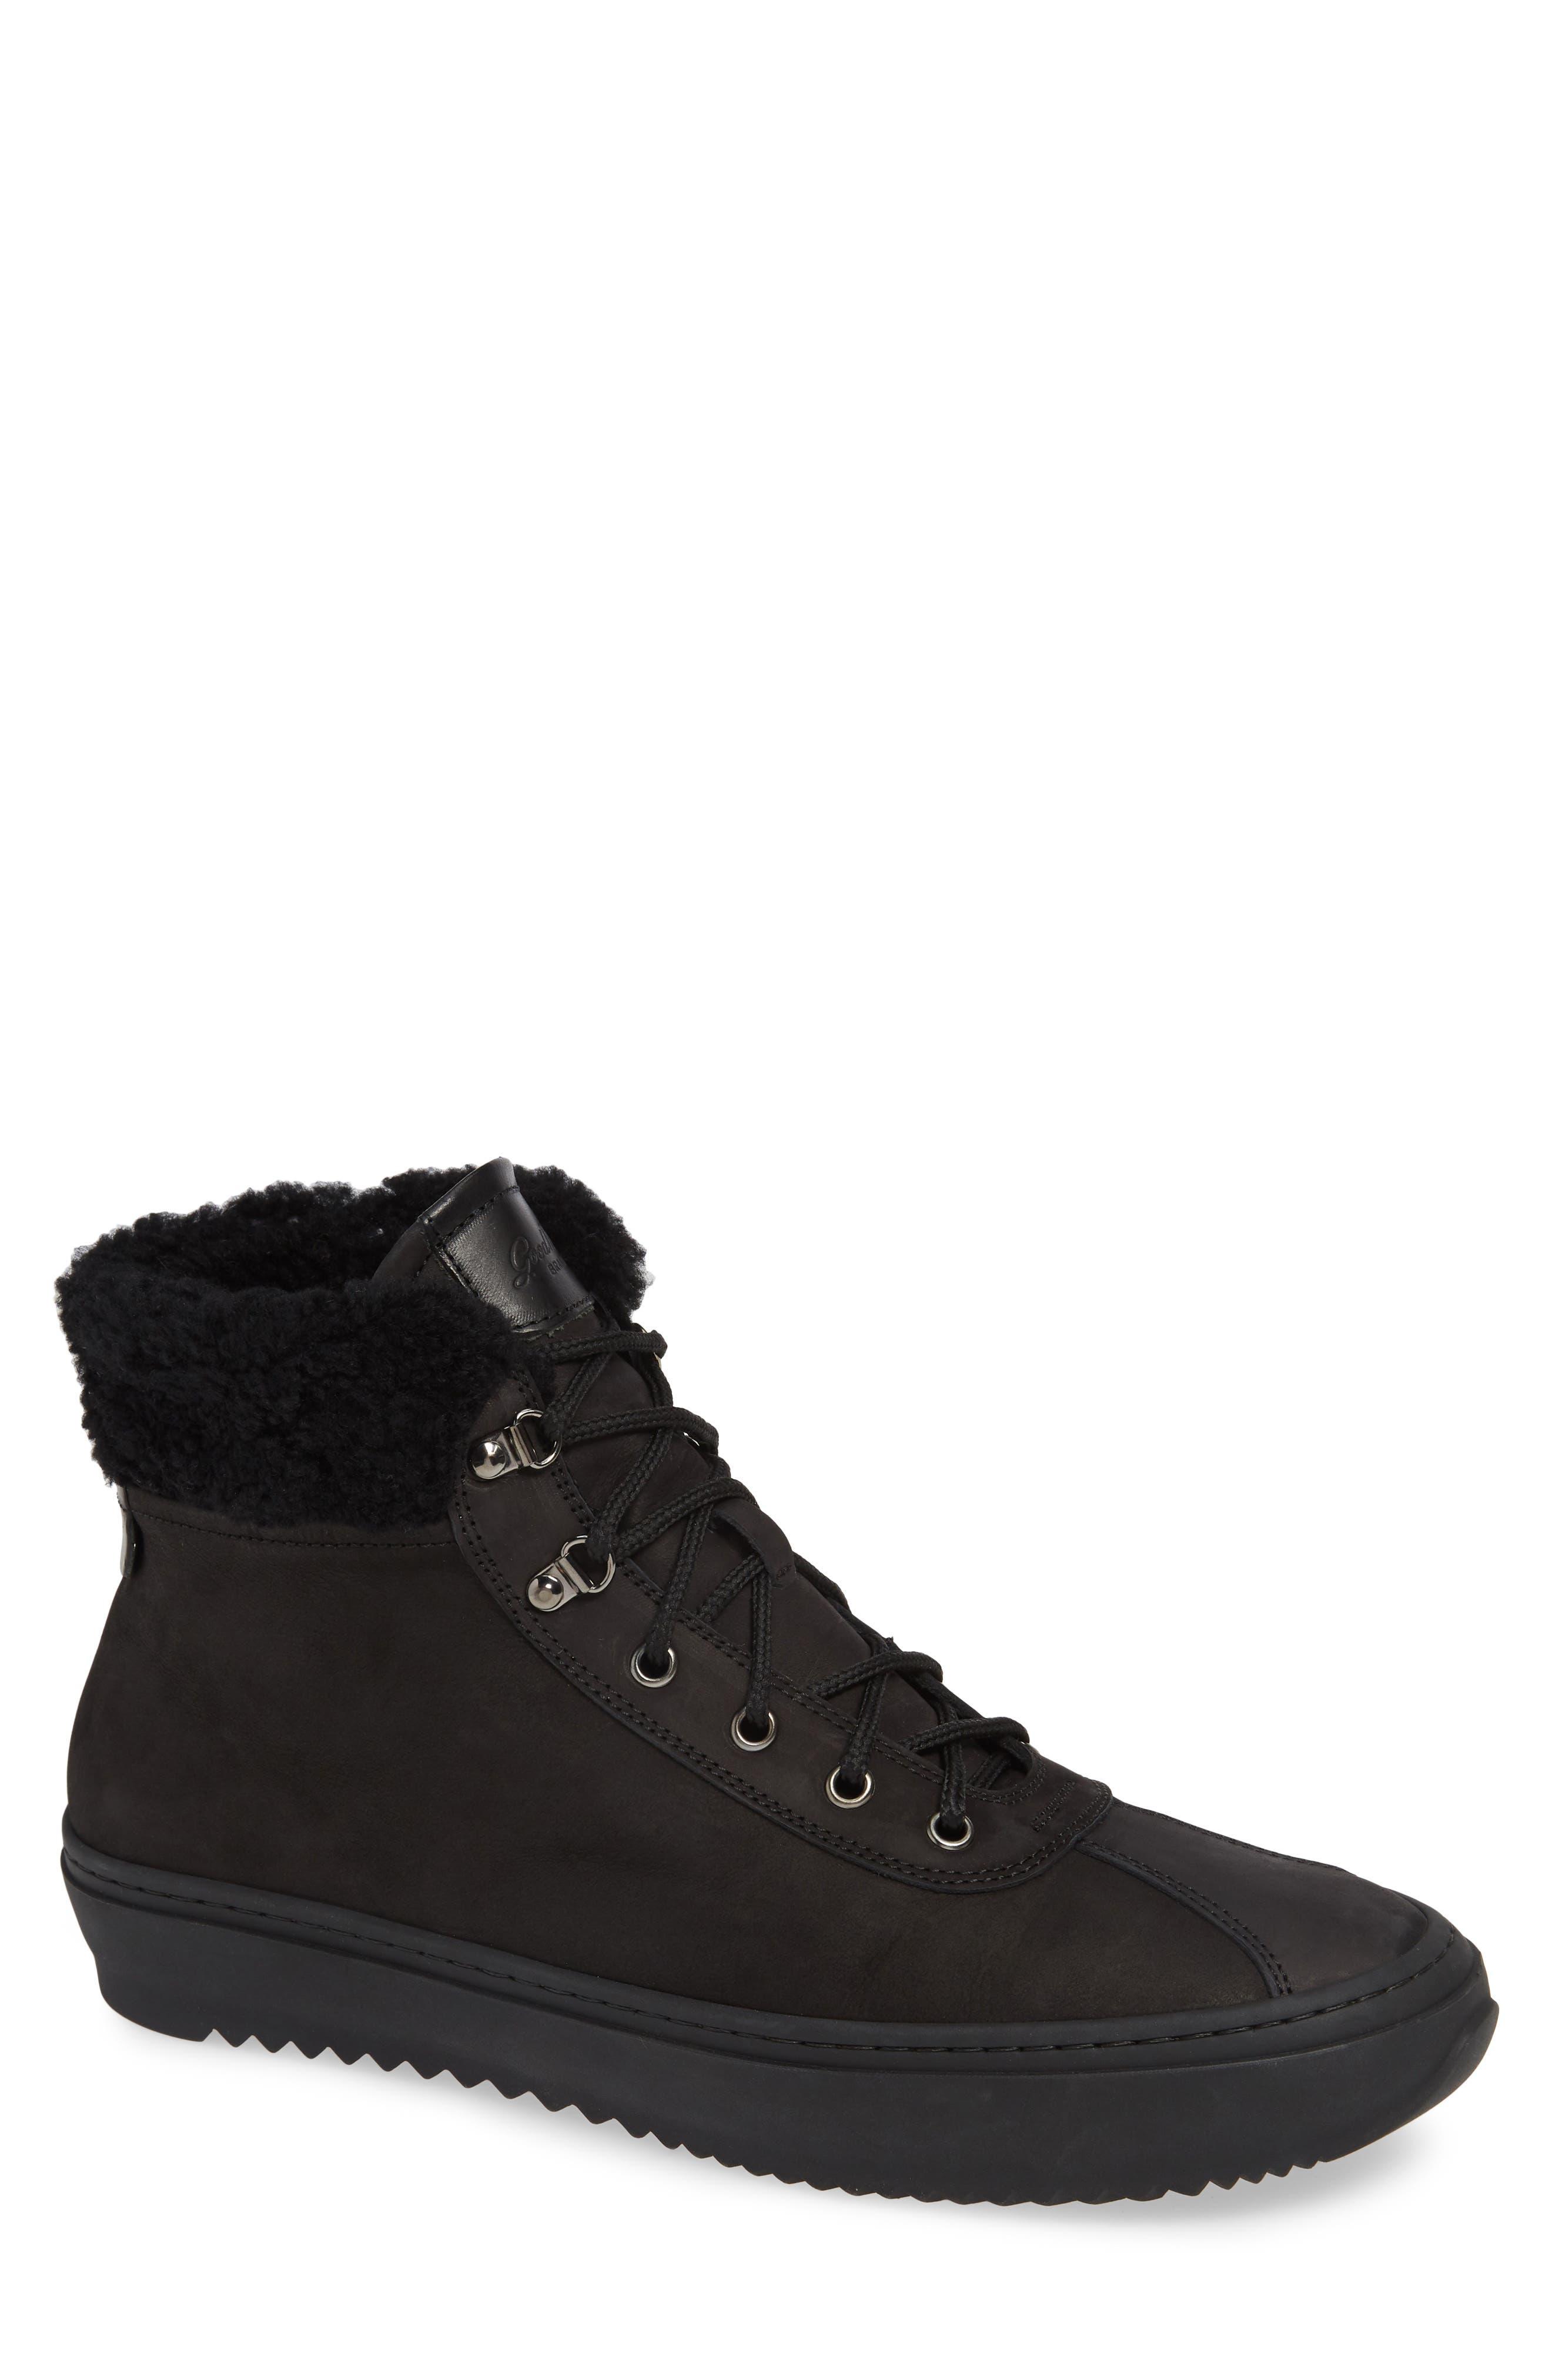 Hiker Street Sneaker,                         Main,                         color, BLACK LEATHER